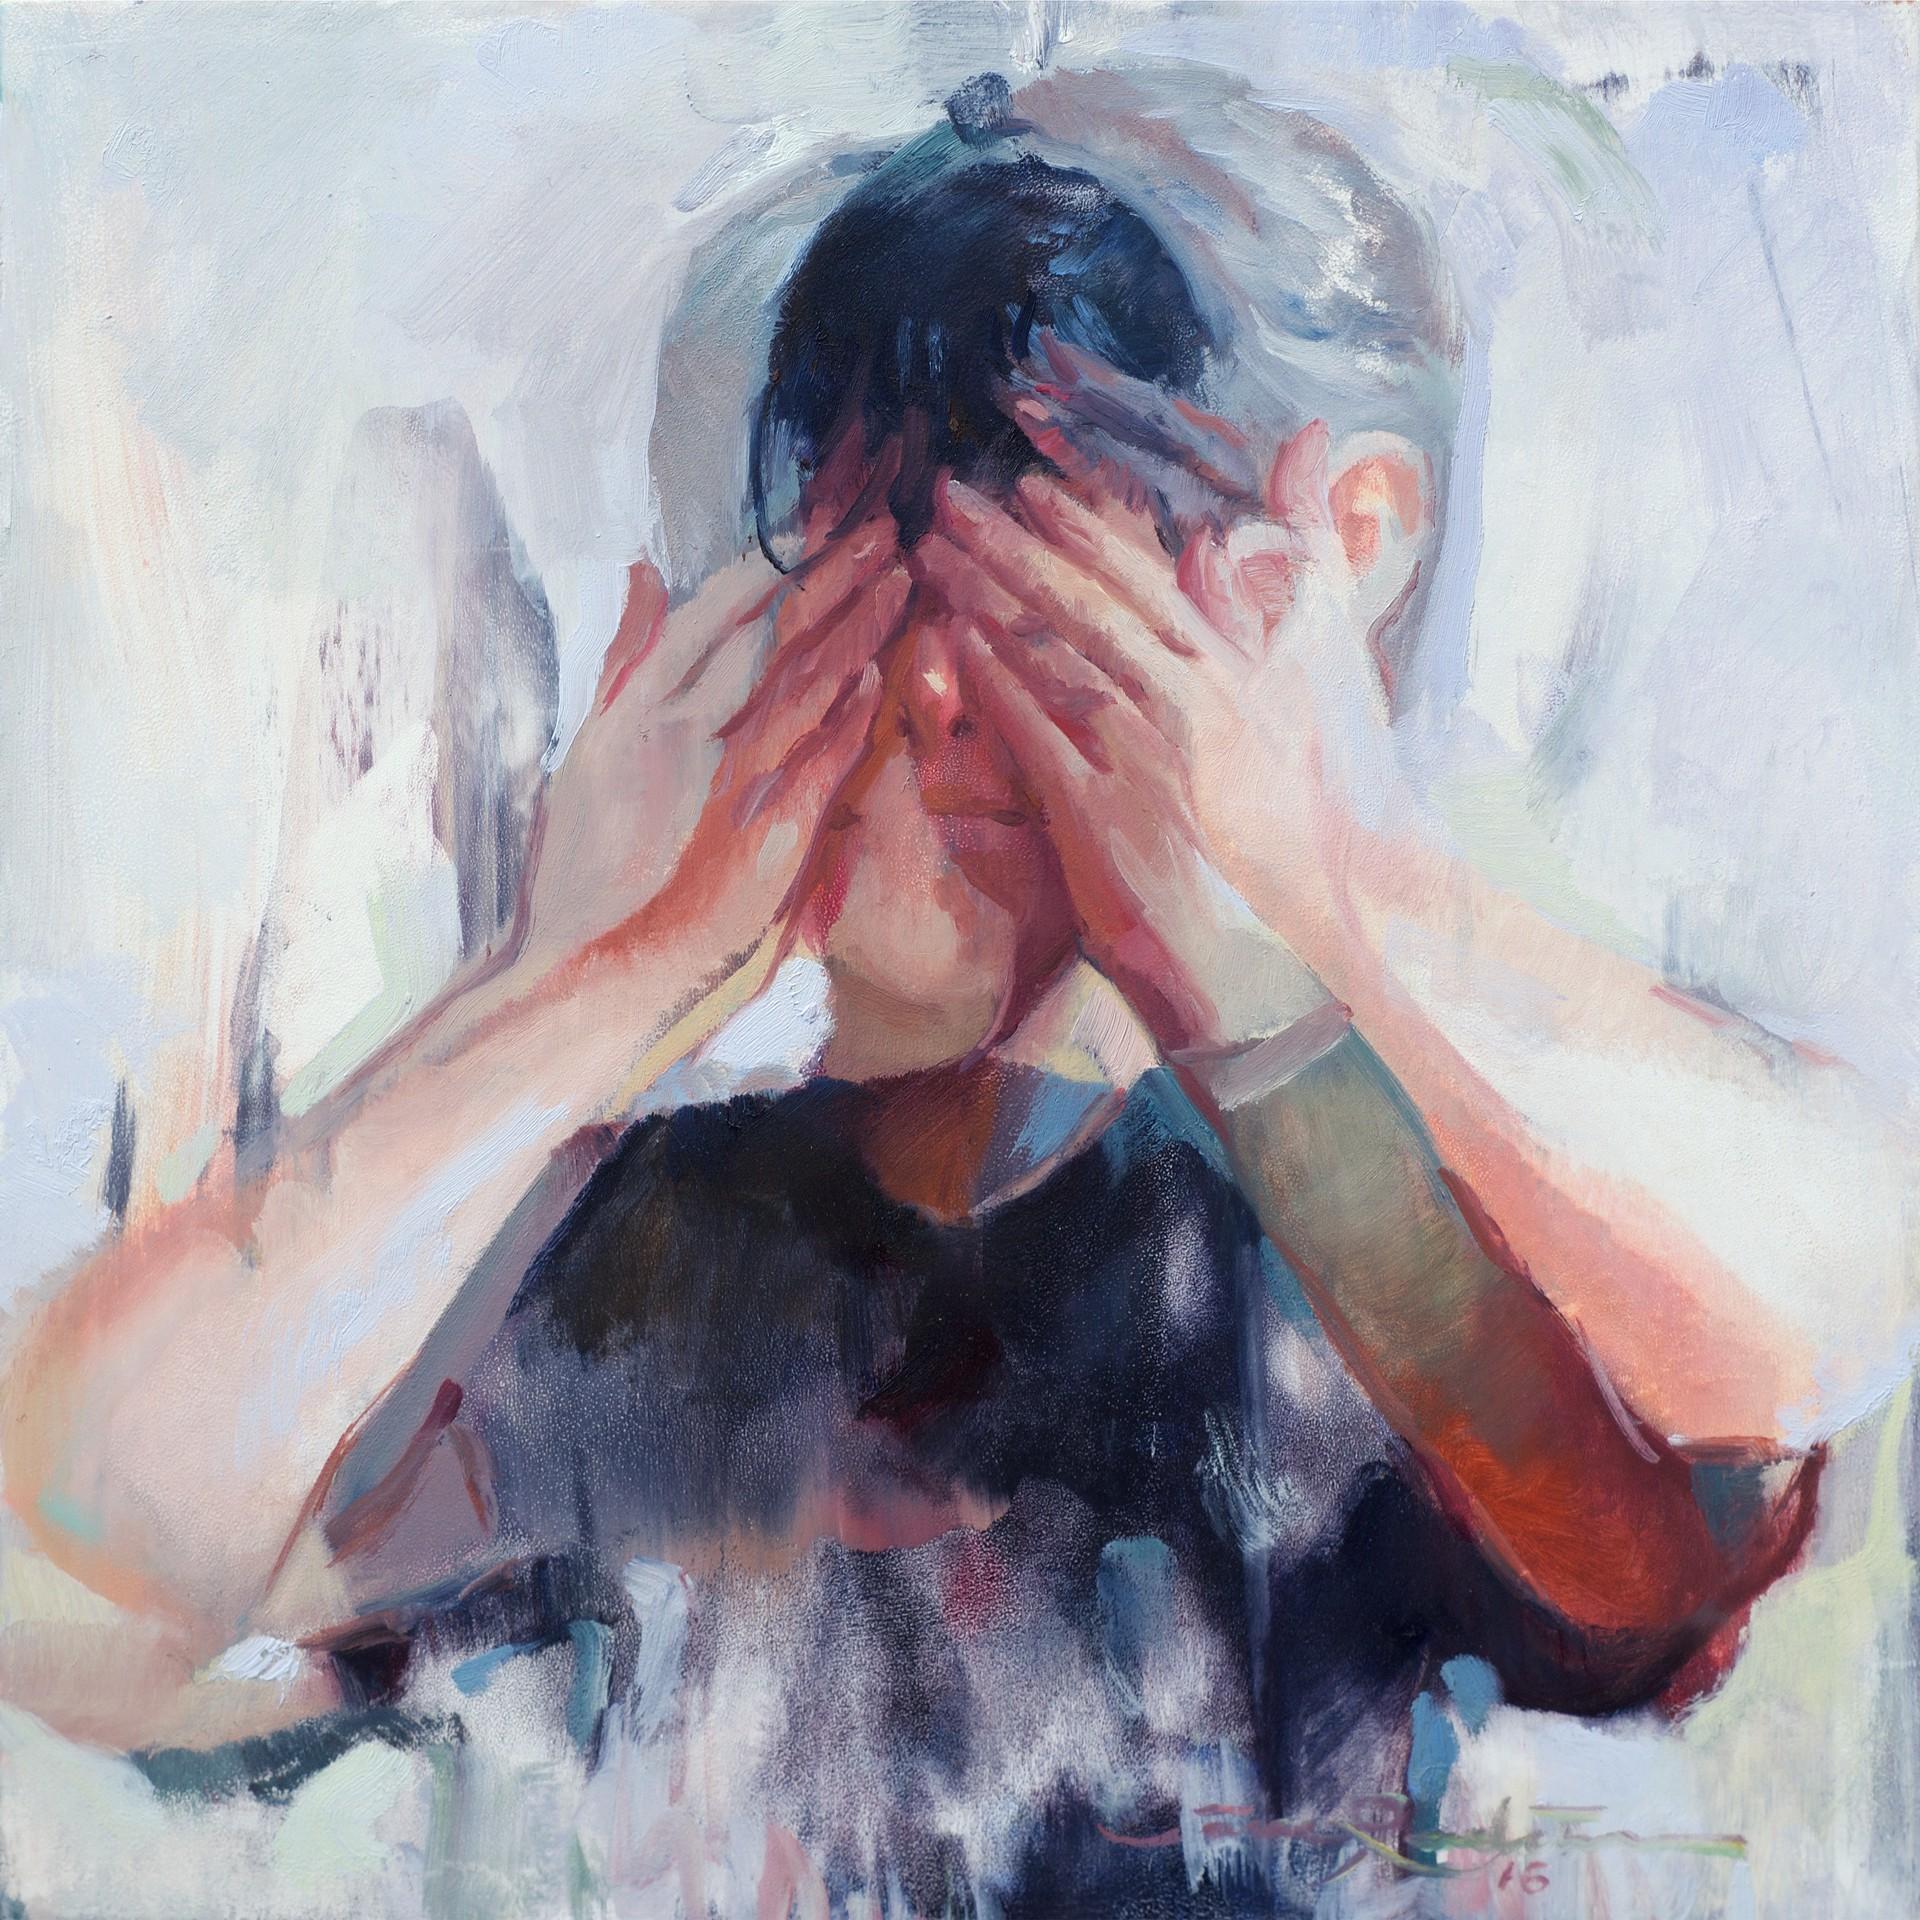 Blind by Jane Radstrom